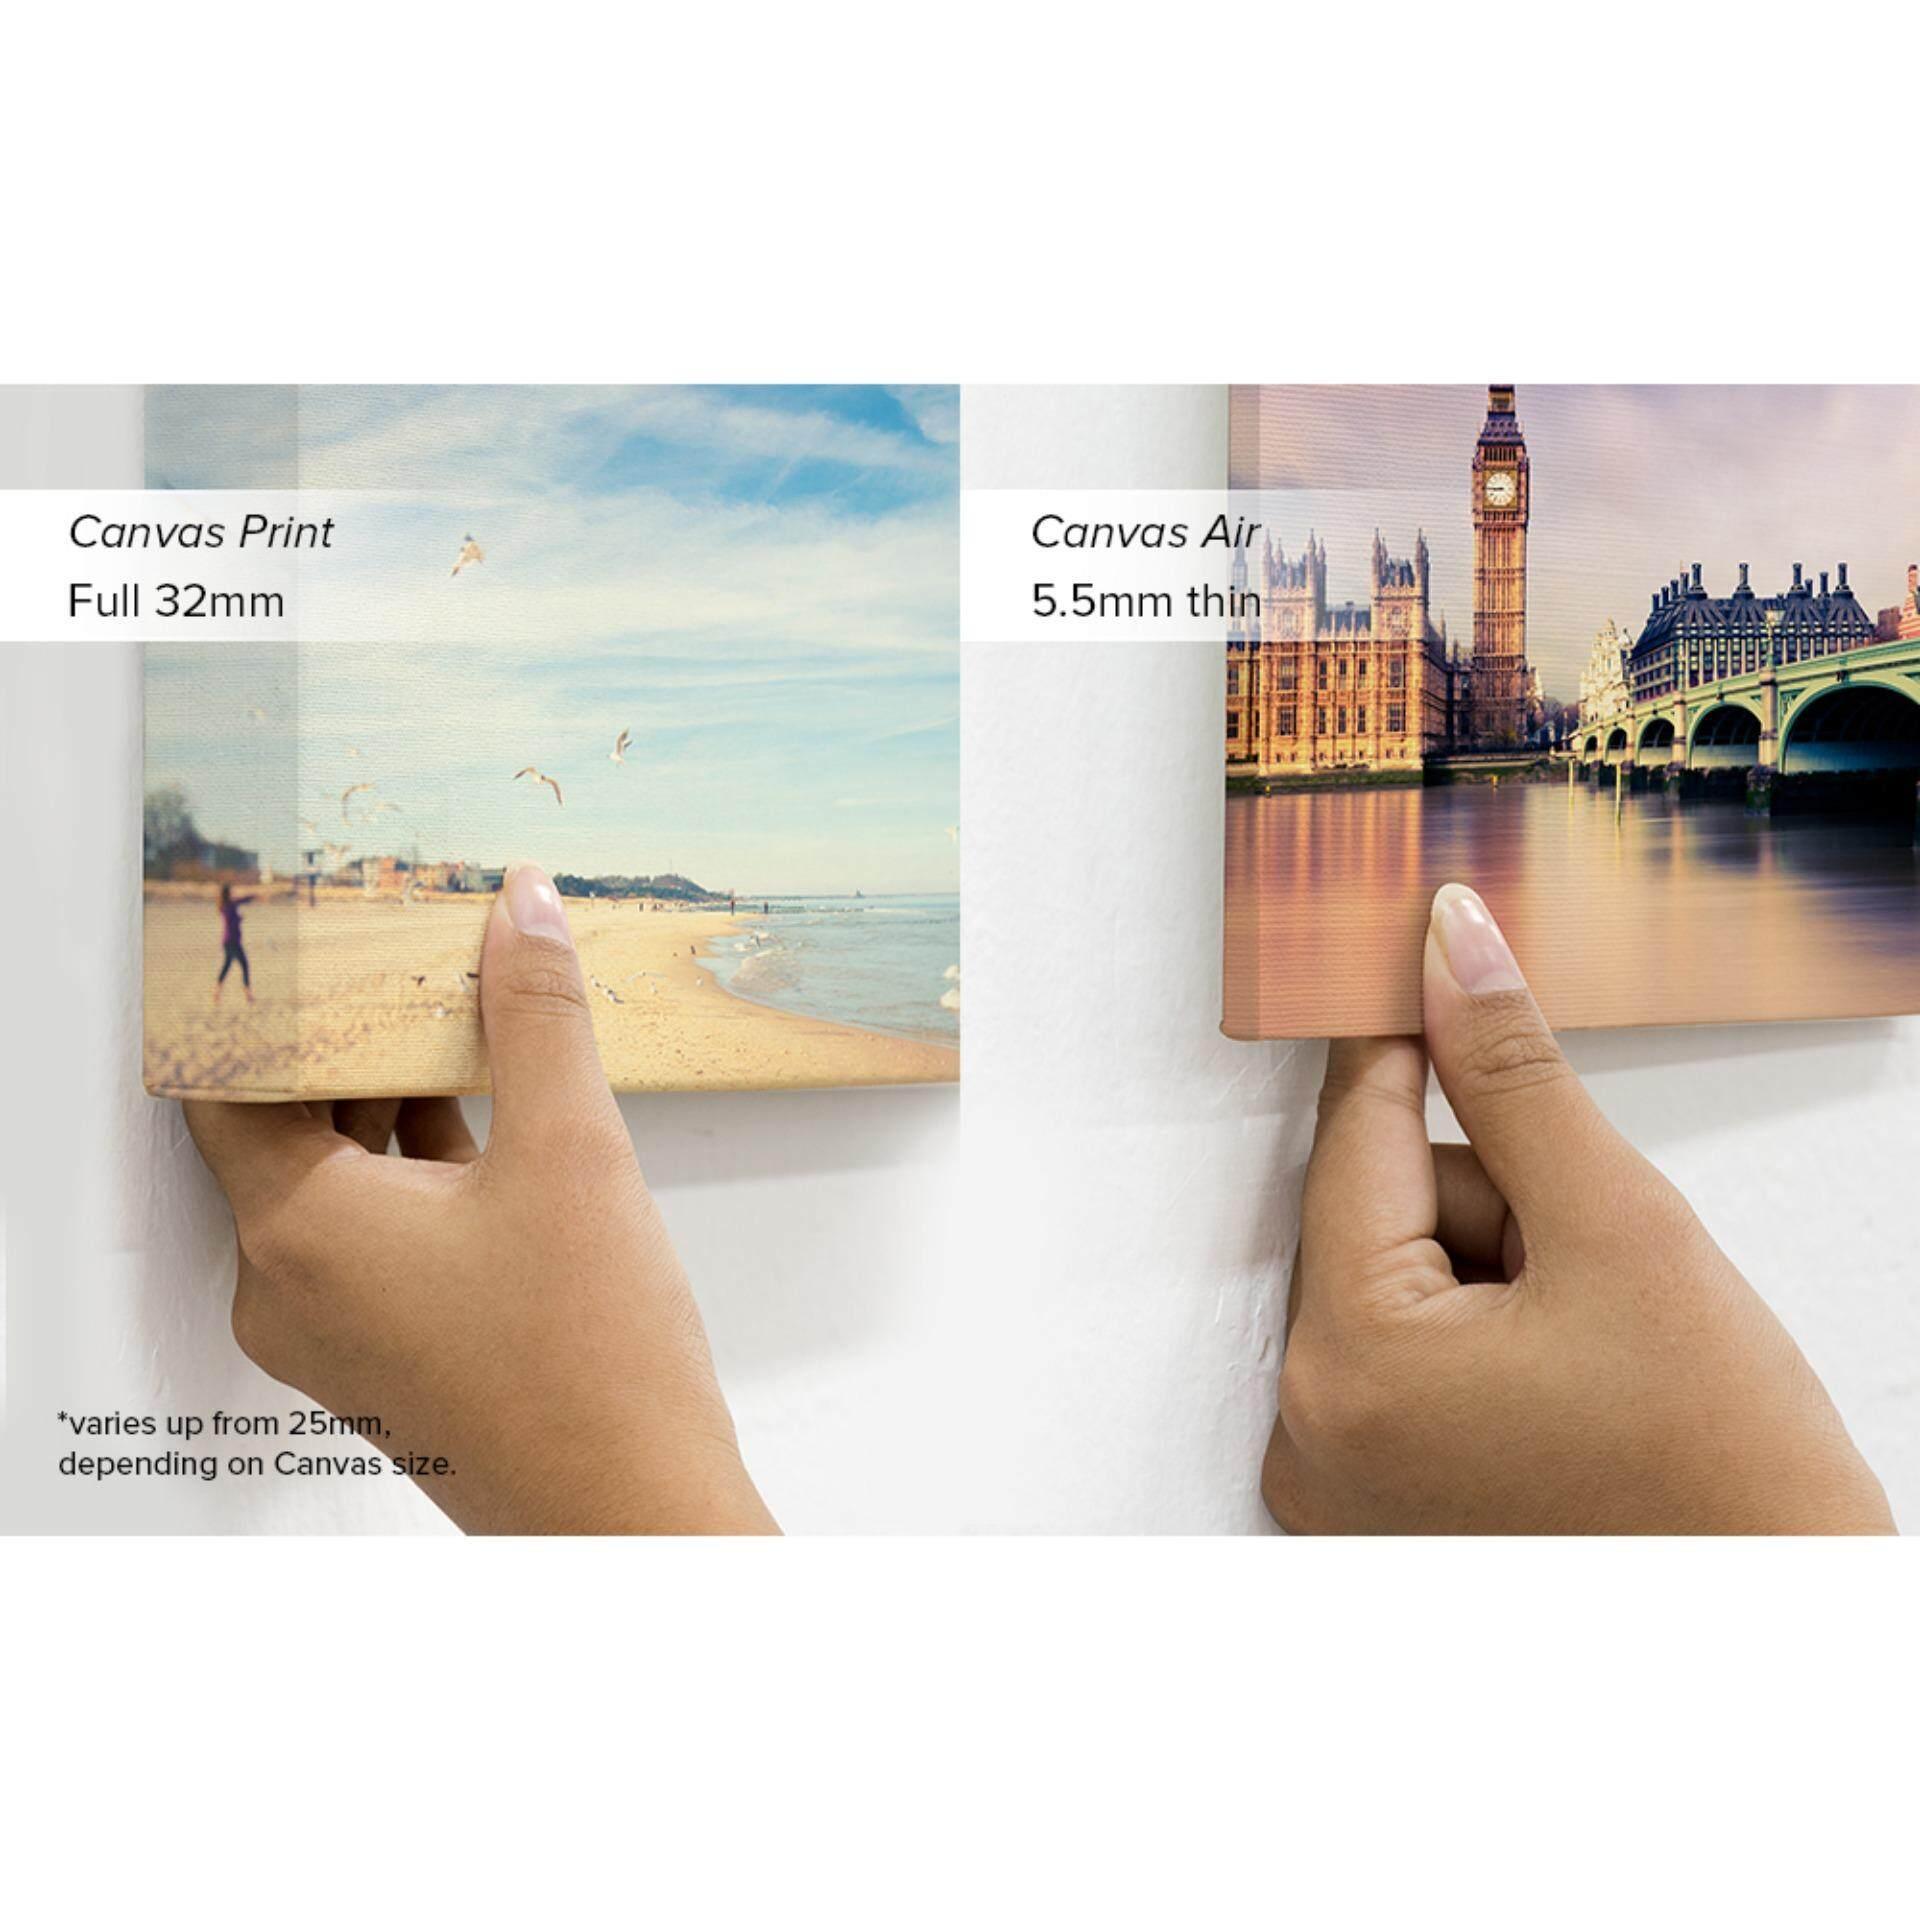 "Photobook Malaysia 12"" x 18"" Personalised Portrait/Landscape Canvas Air"